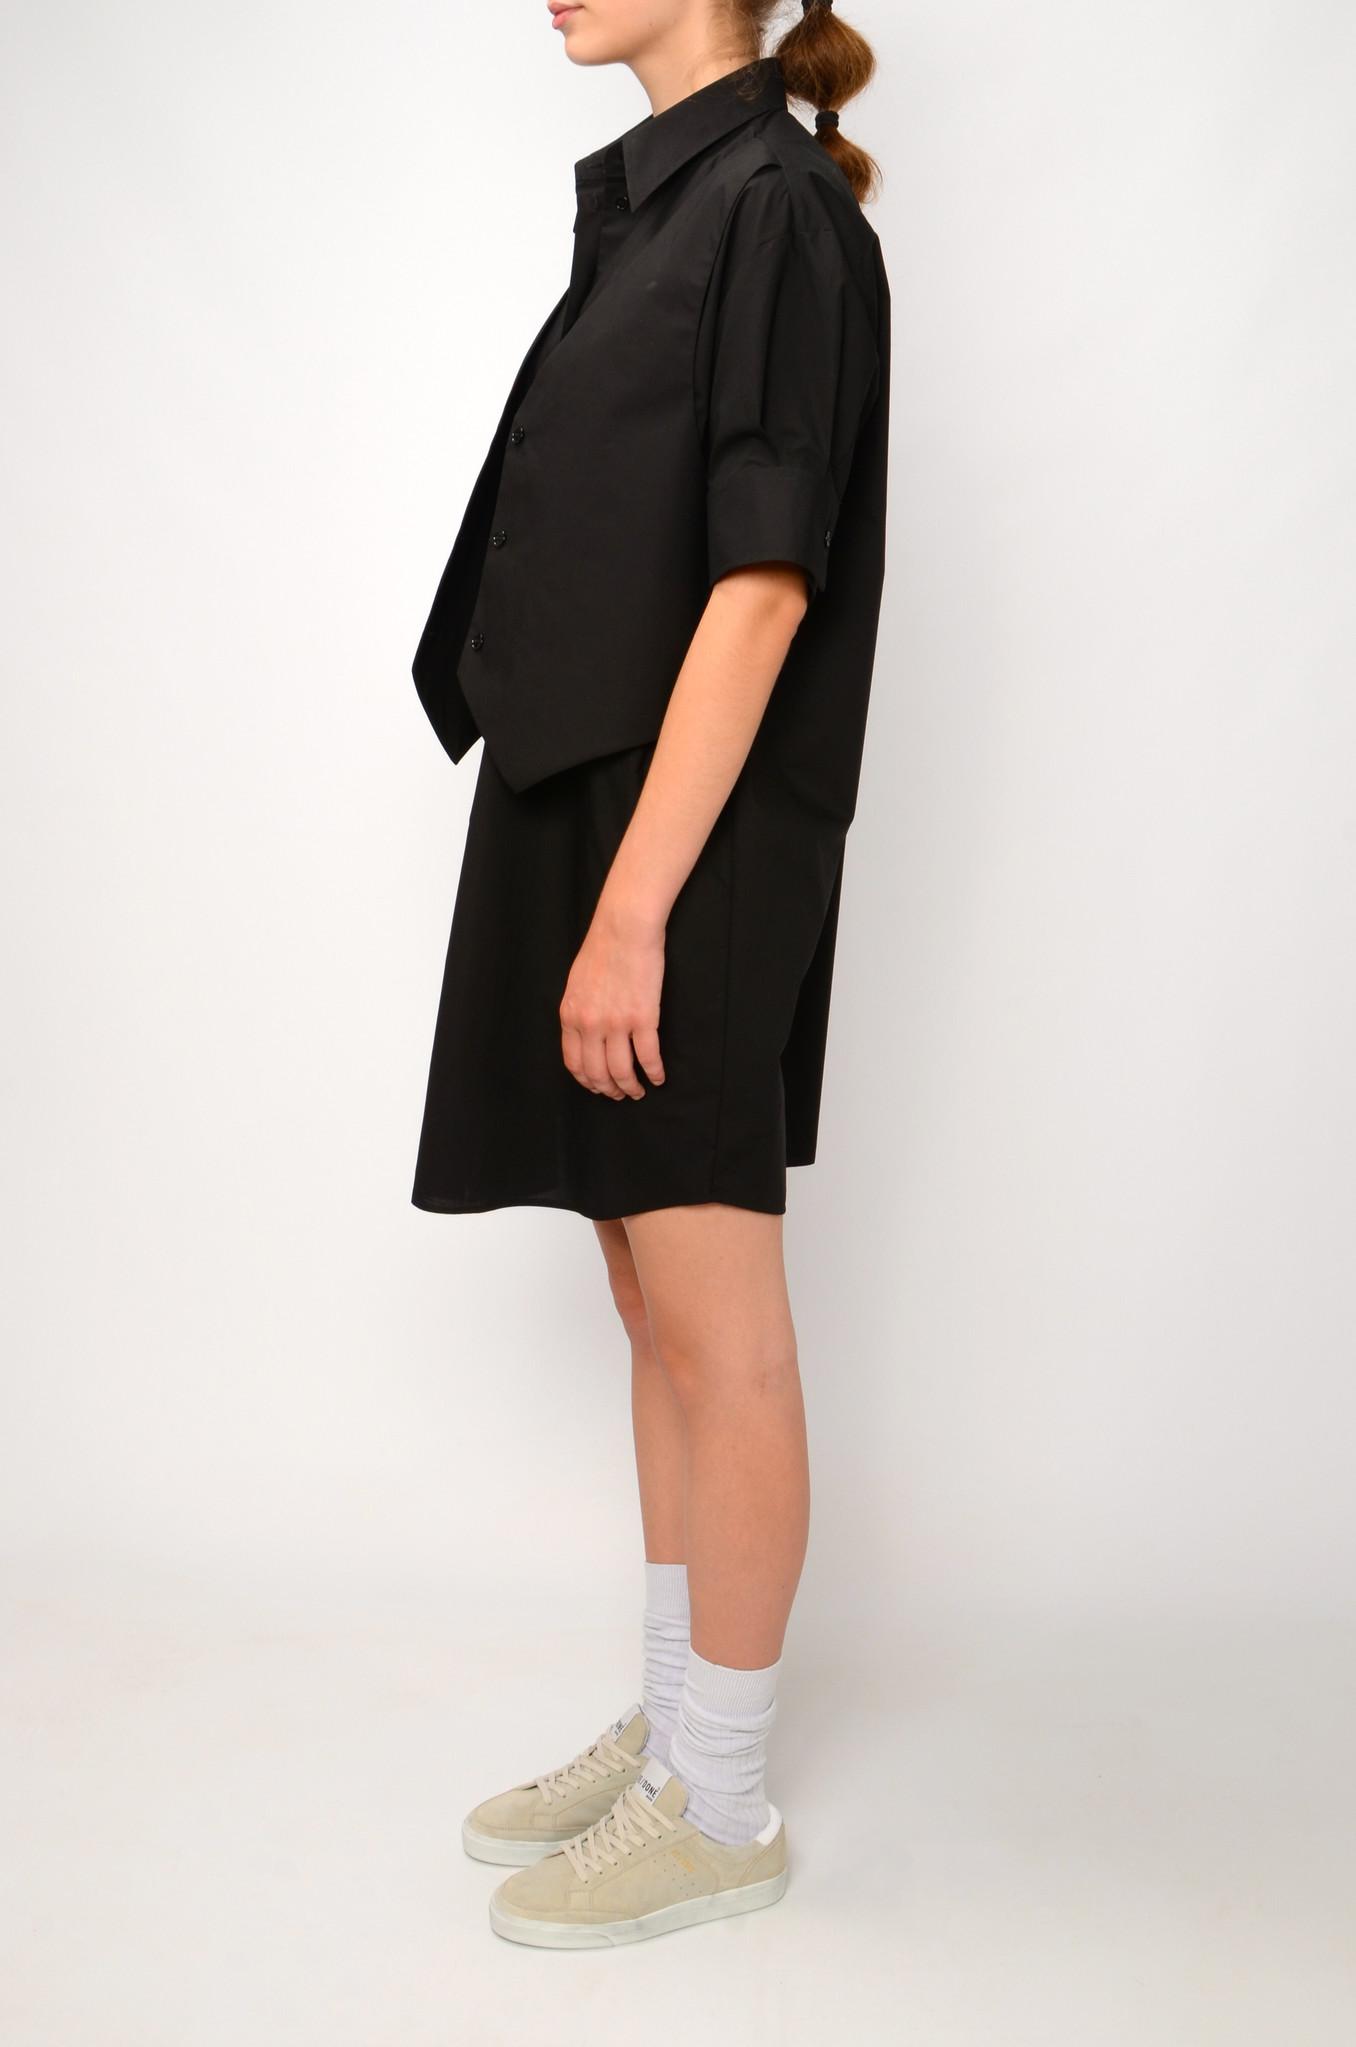 WAISTCOAT SHIRT DRESS IN BLACK-3